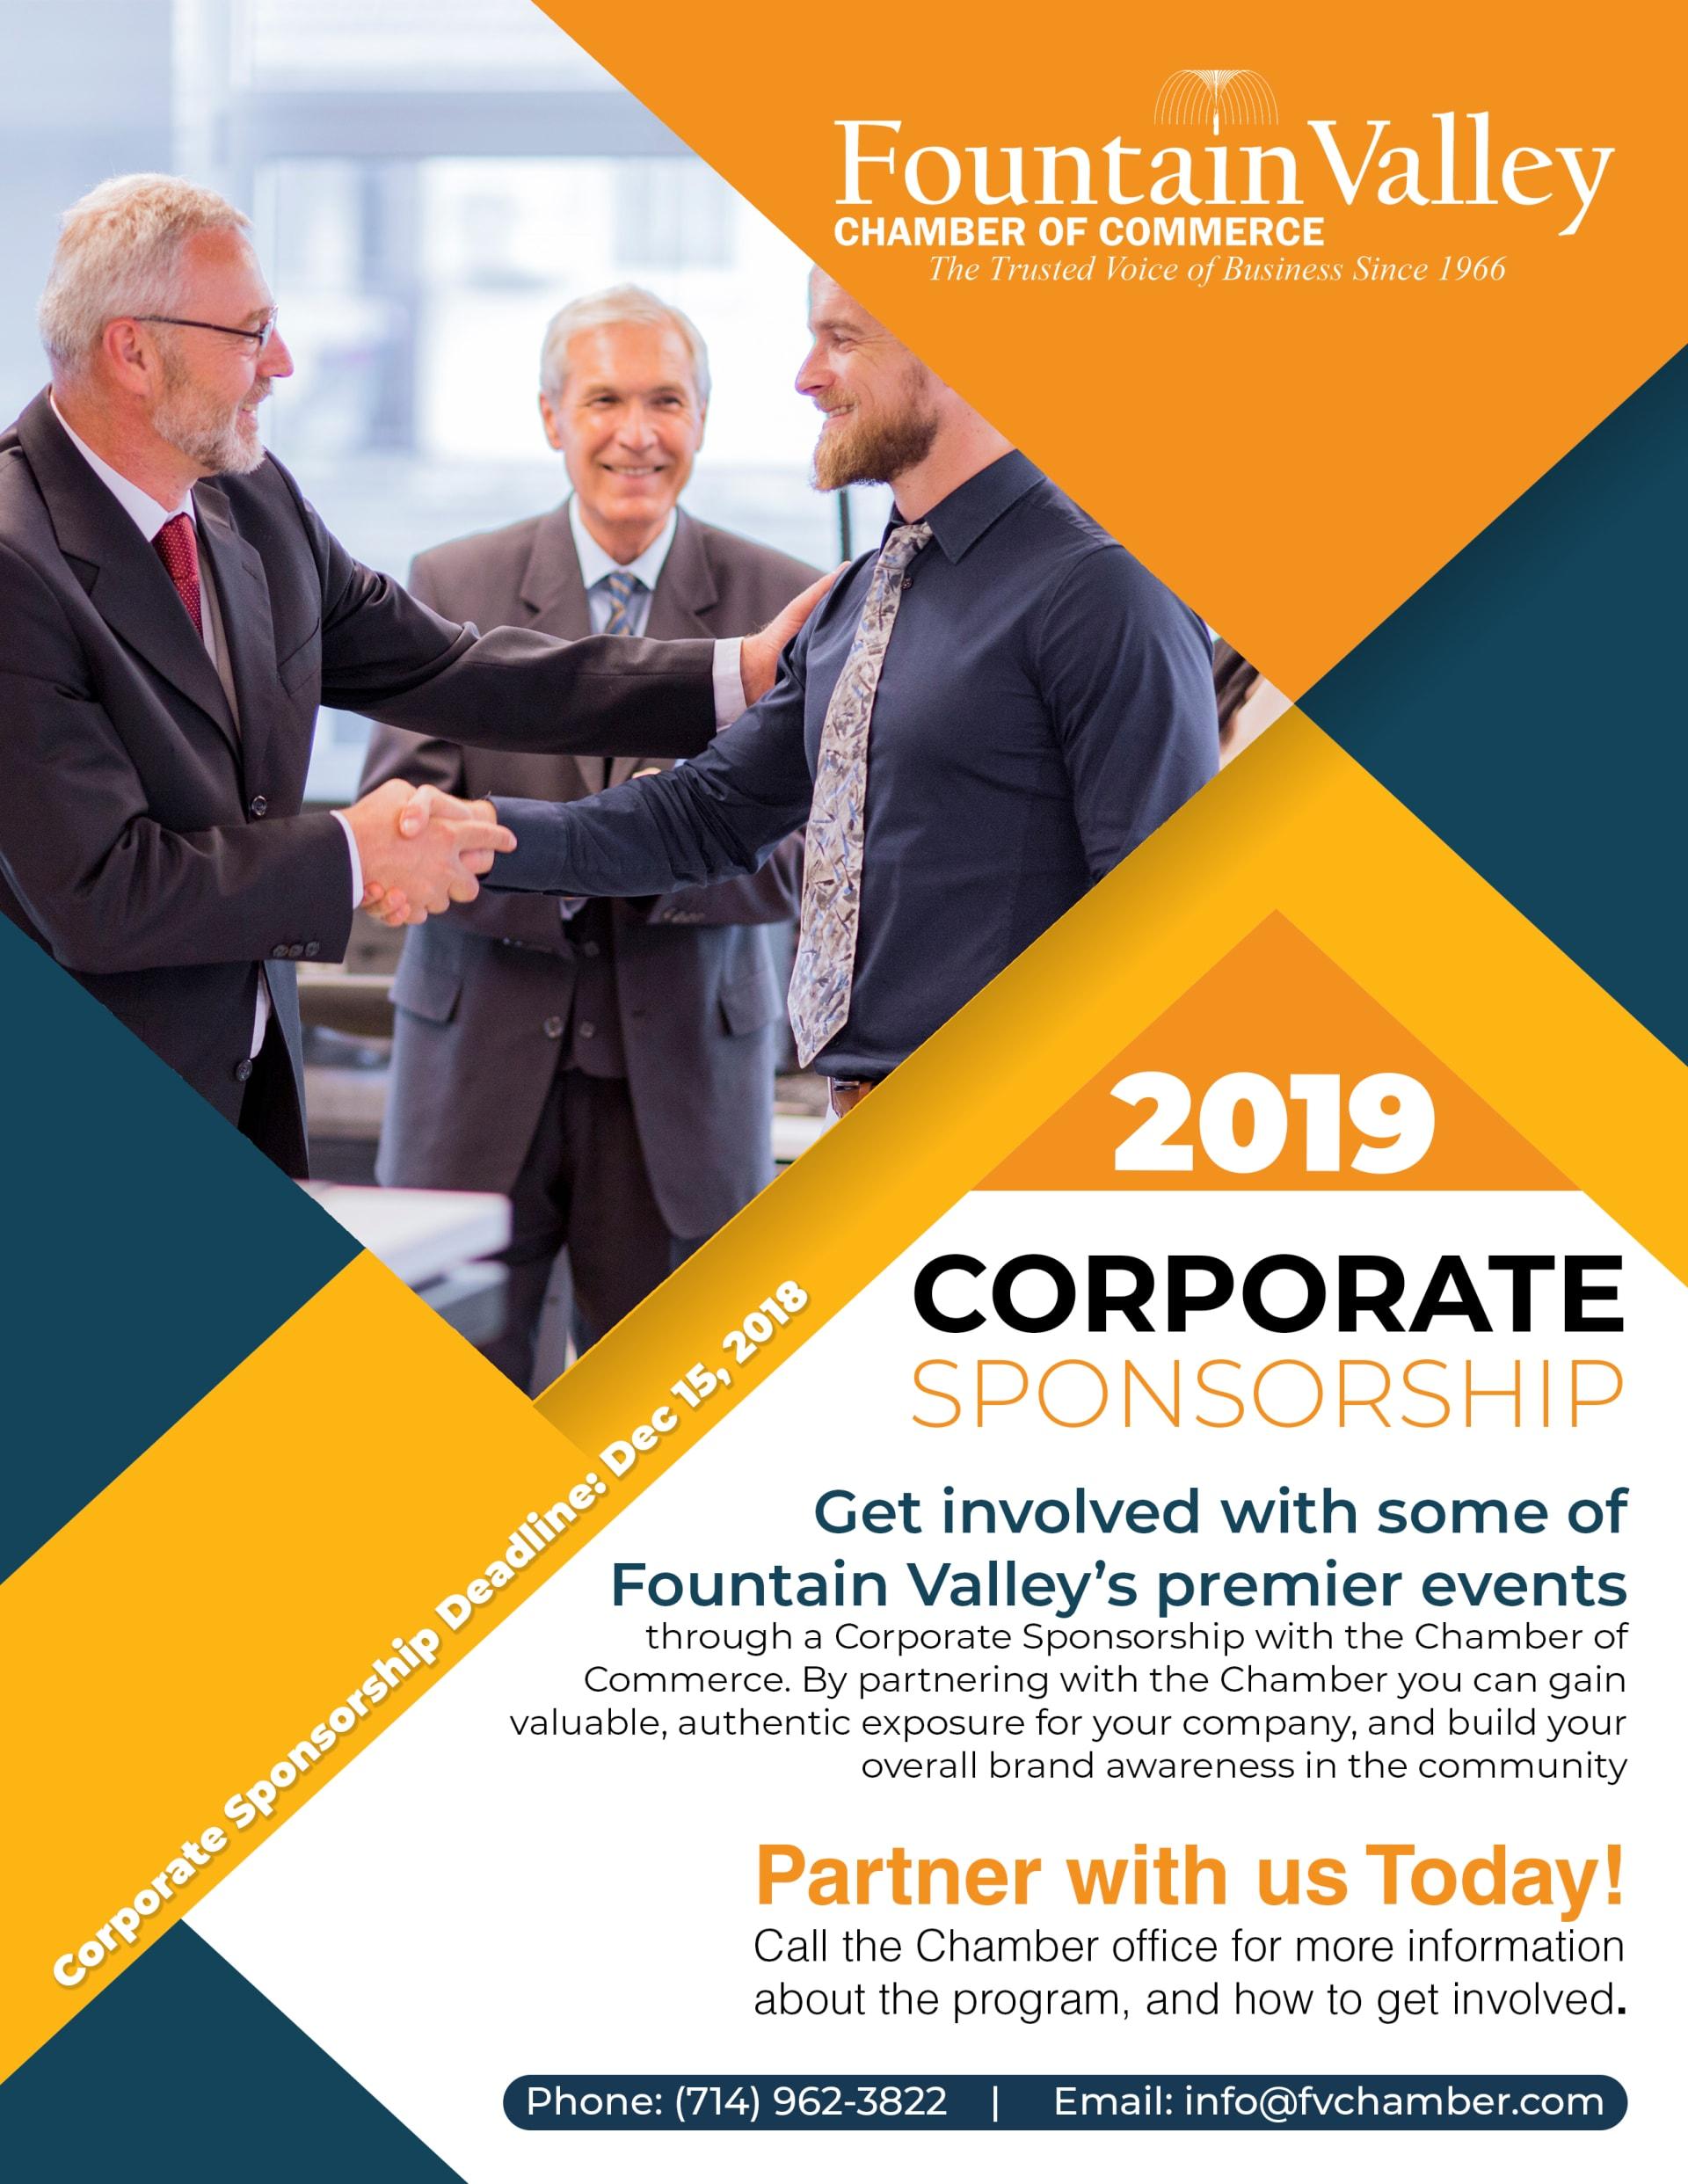 Corporate-Sponsorship-Flyer-w1920.jpg